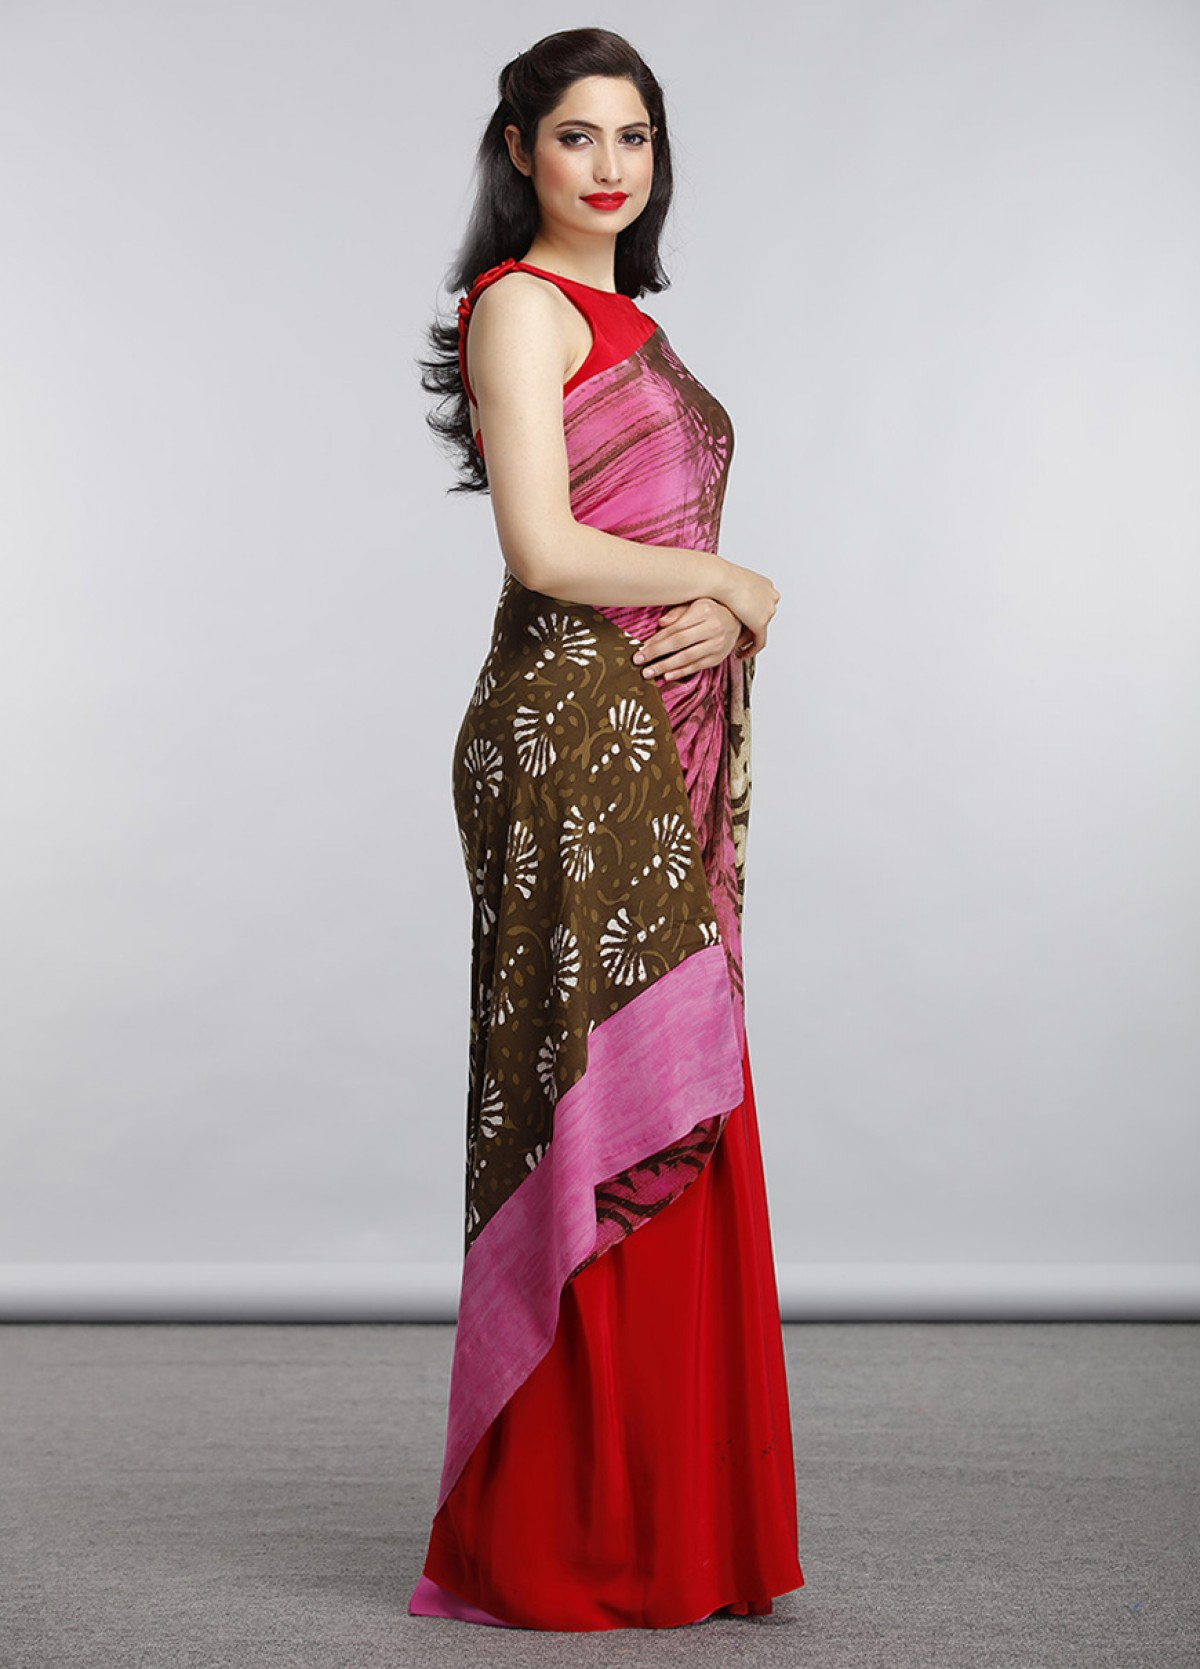 The Jaipuri Block Print Sari